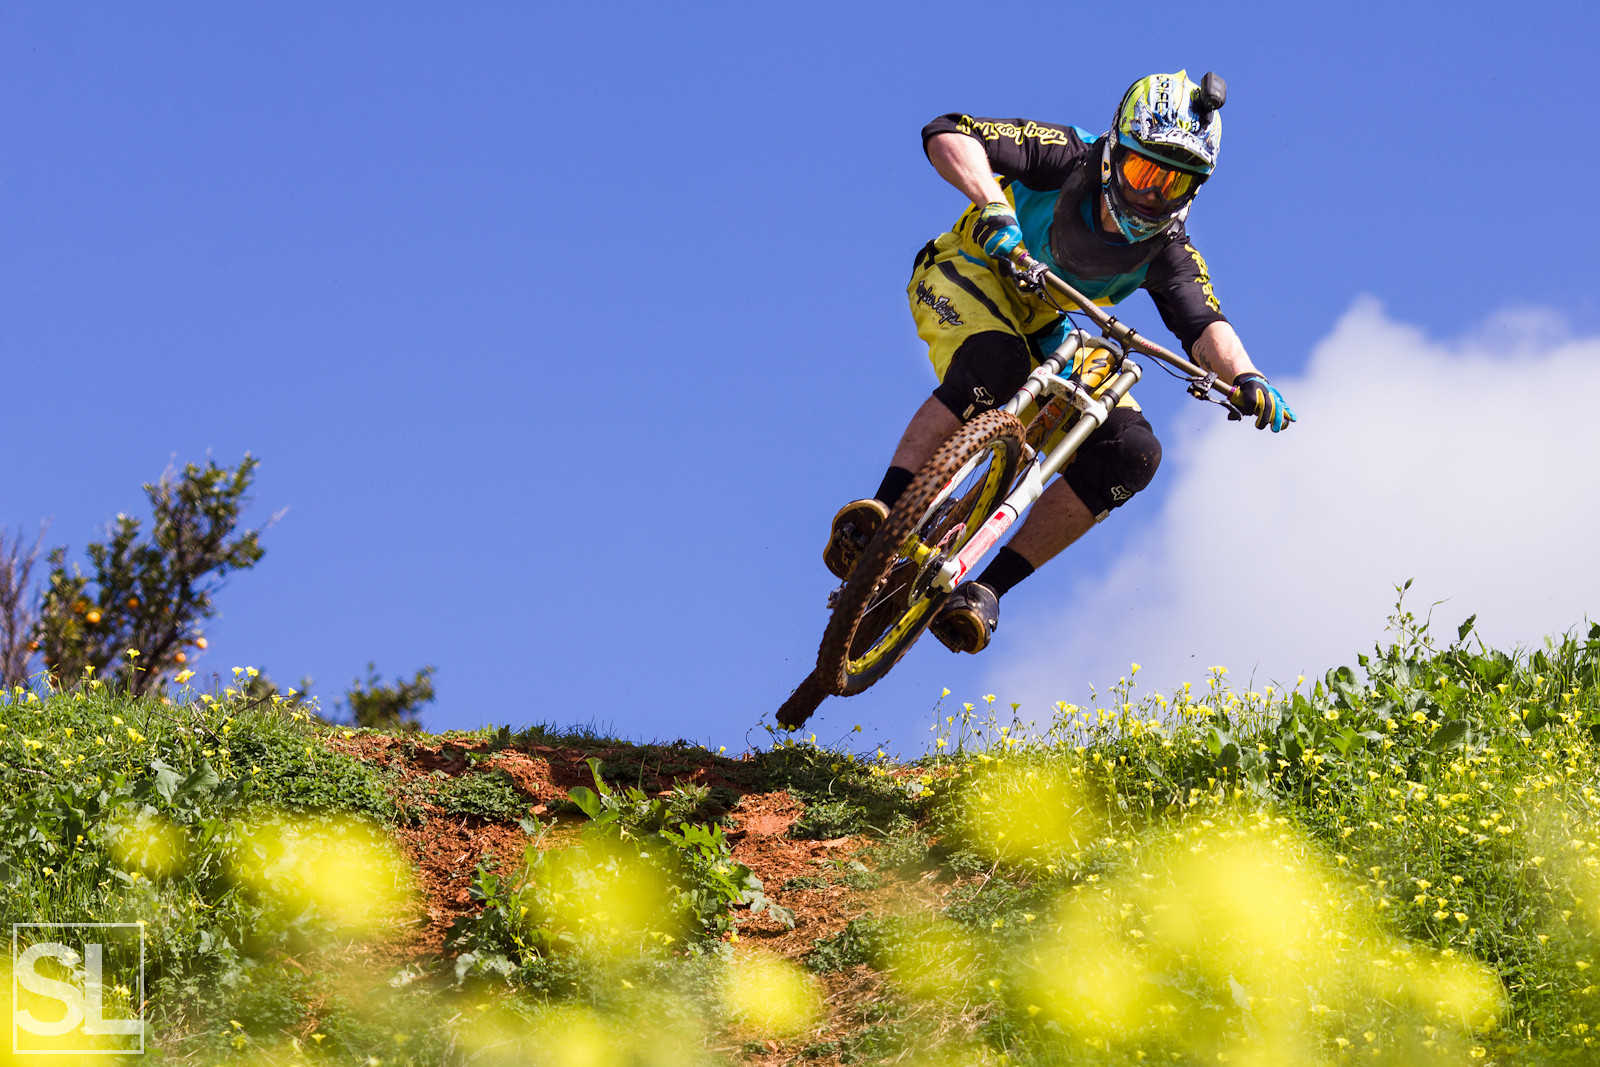 get low - Chamakazi - Mountain Biking Pictures - Vital MTB